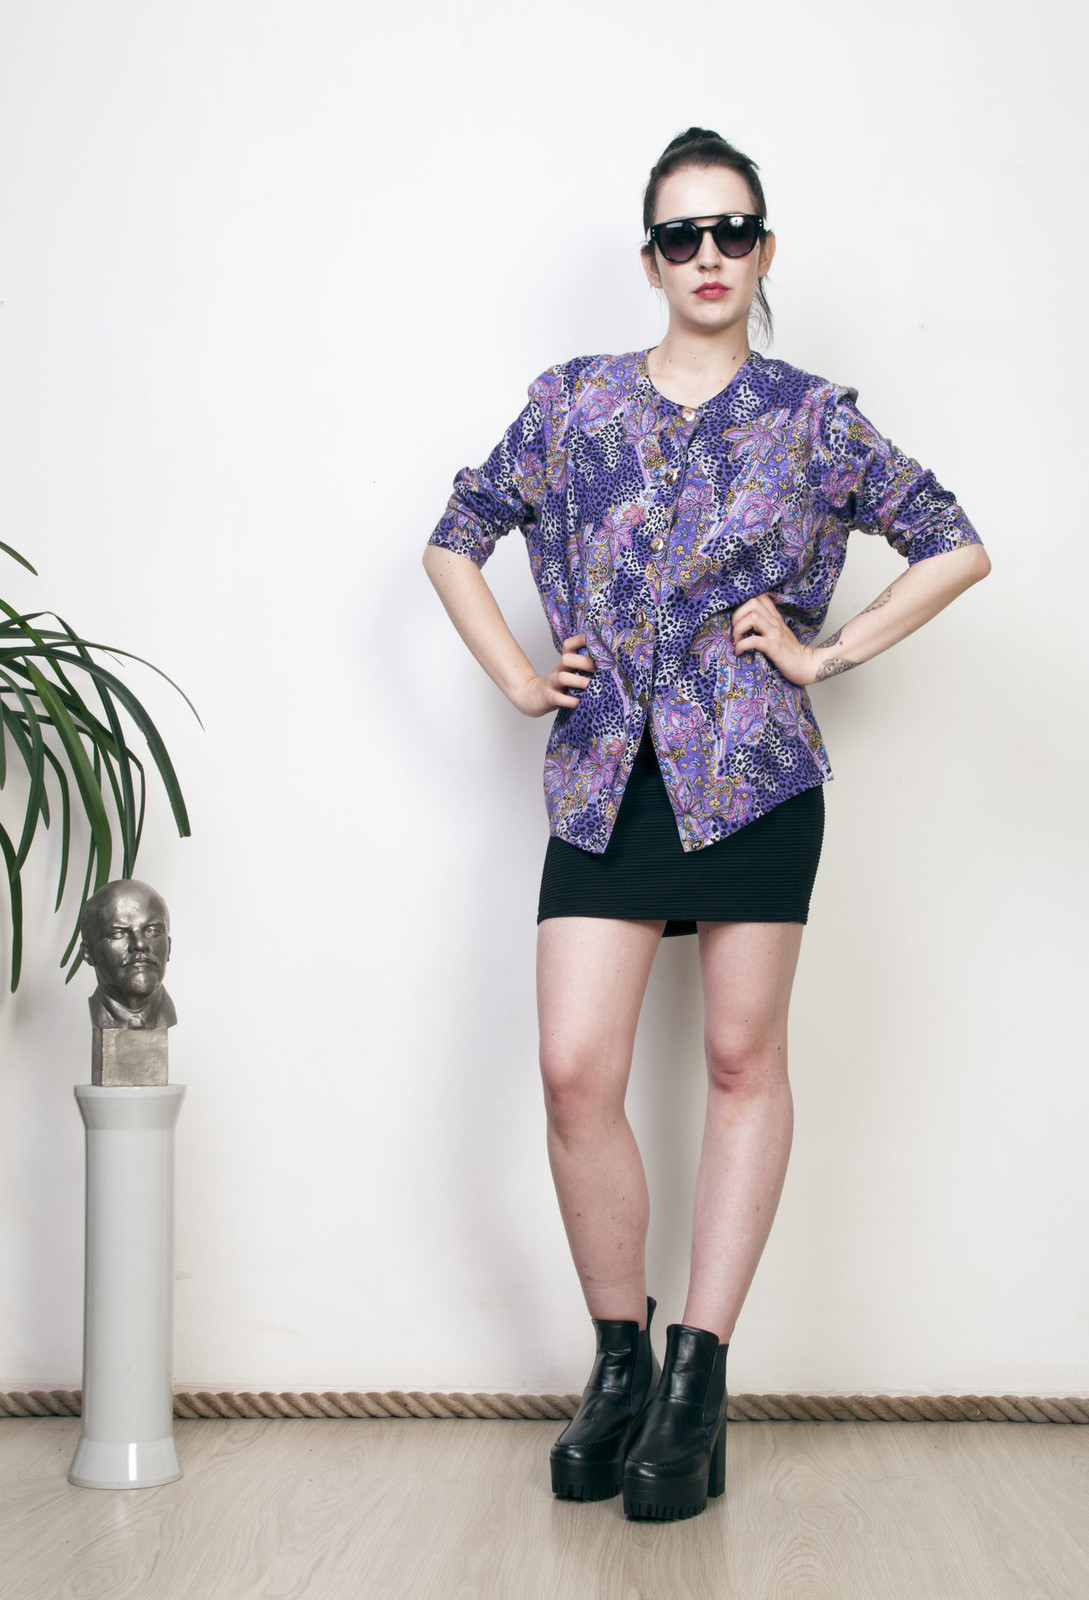 Purple leopard blouse 80s printed oversized vintage top - $32.67